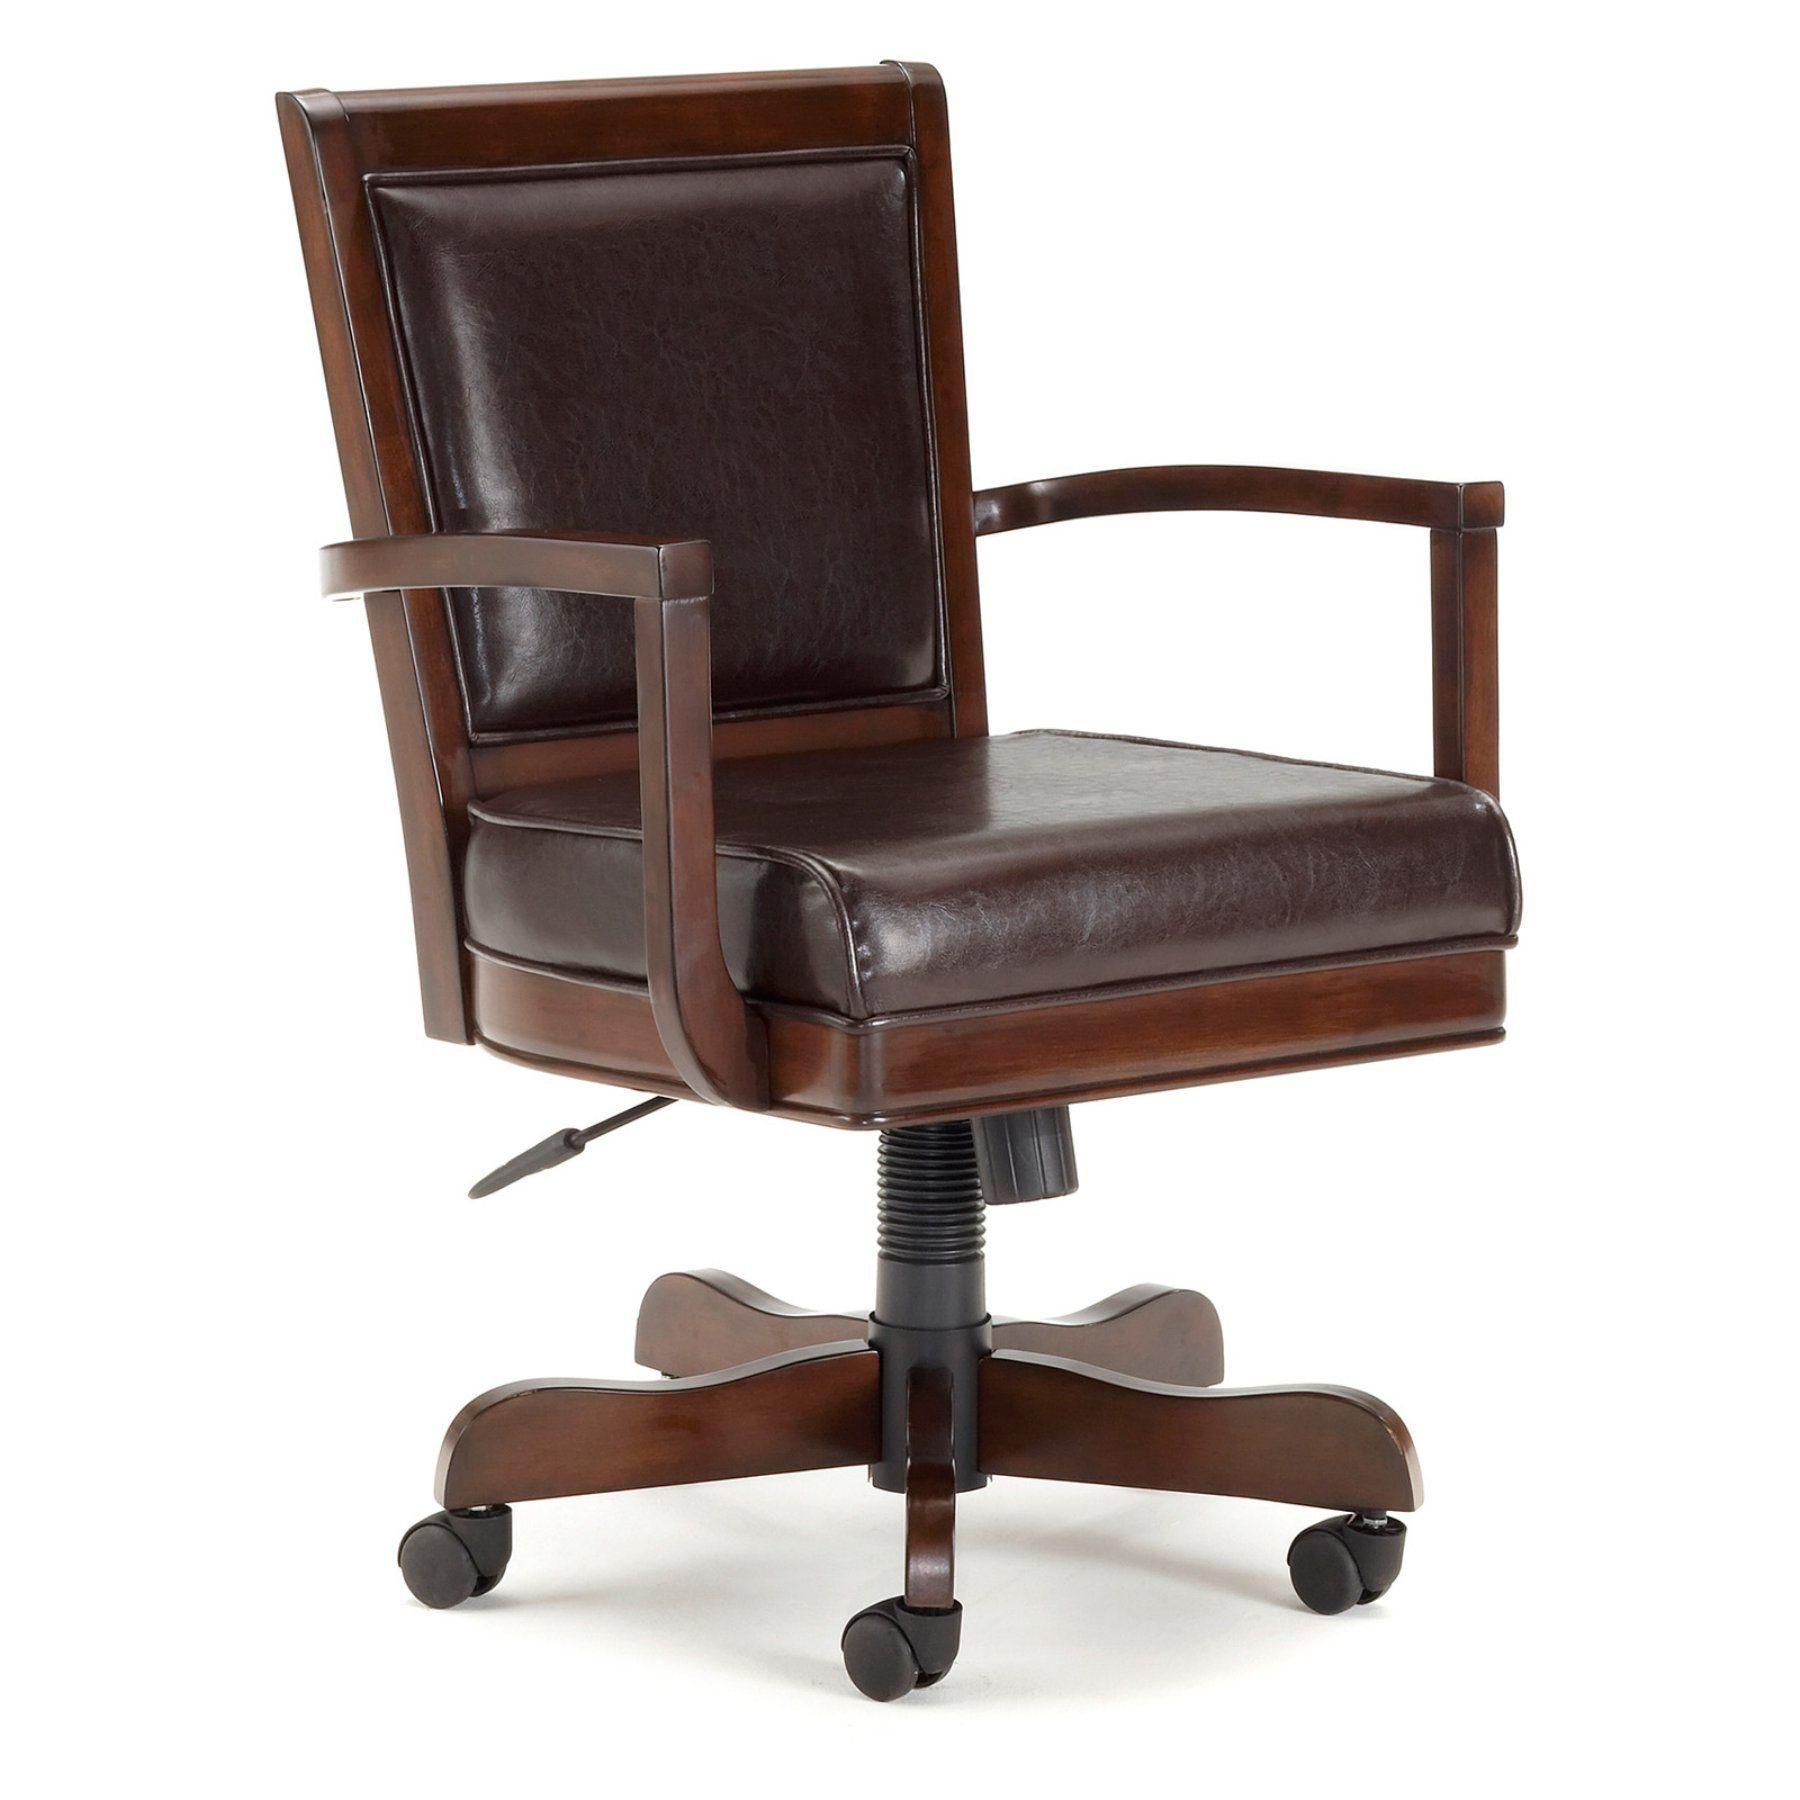 Hillsdale Ambassador Office Chair - 6124-801B | Hillsdale ...